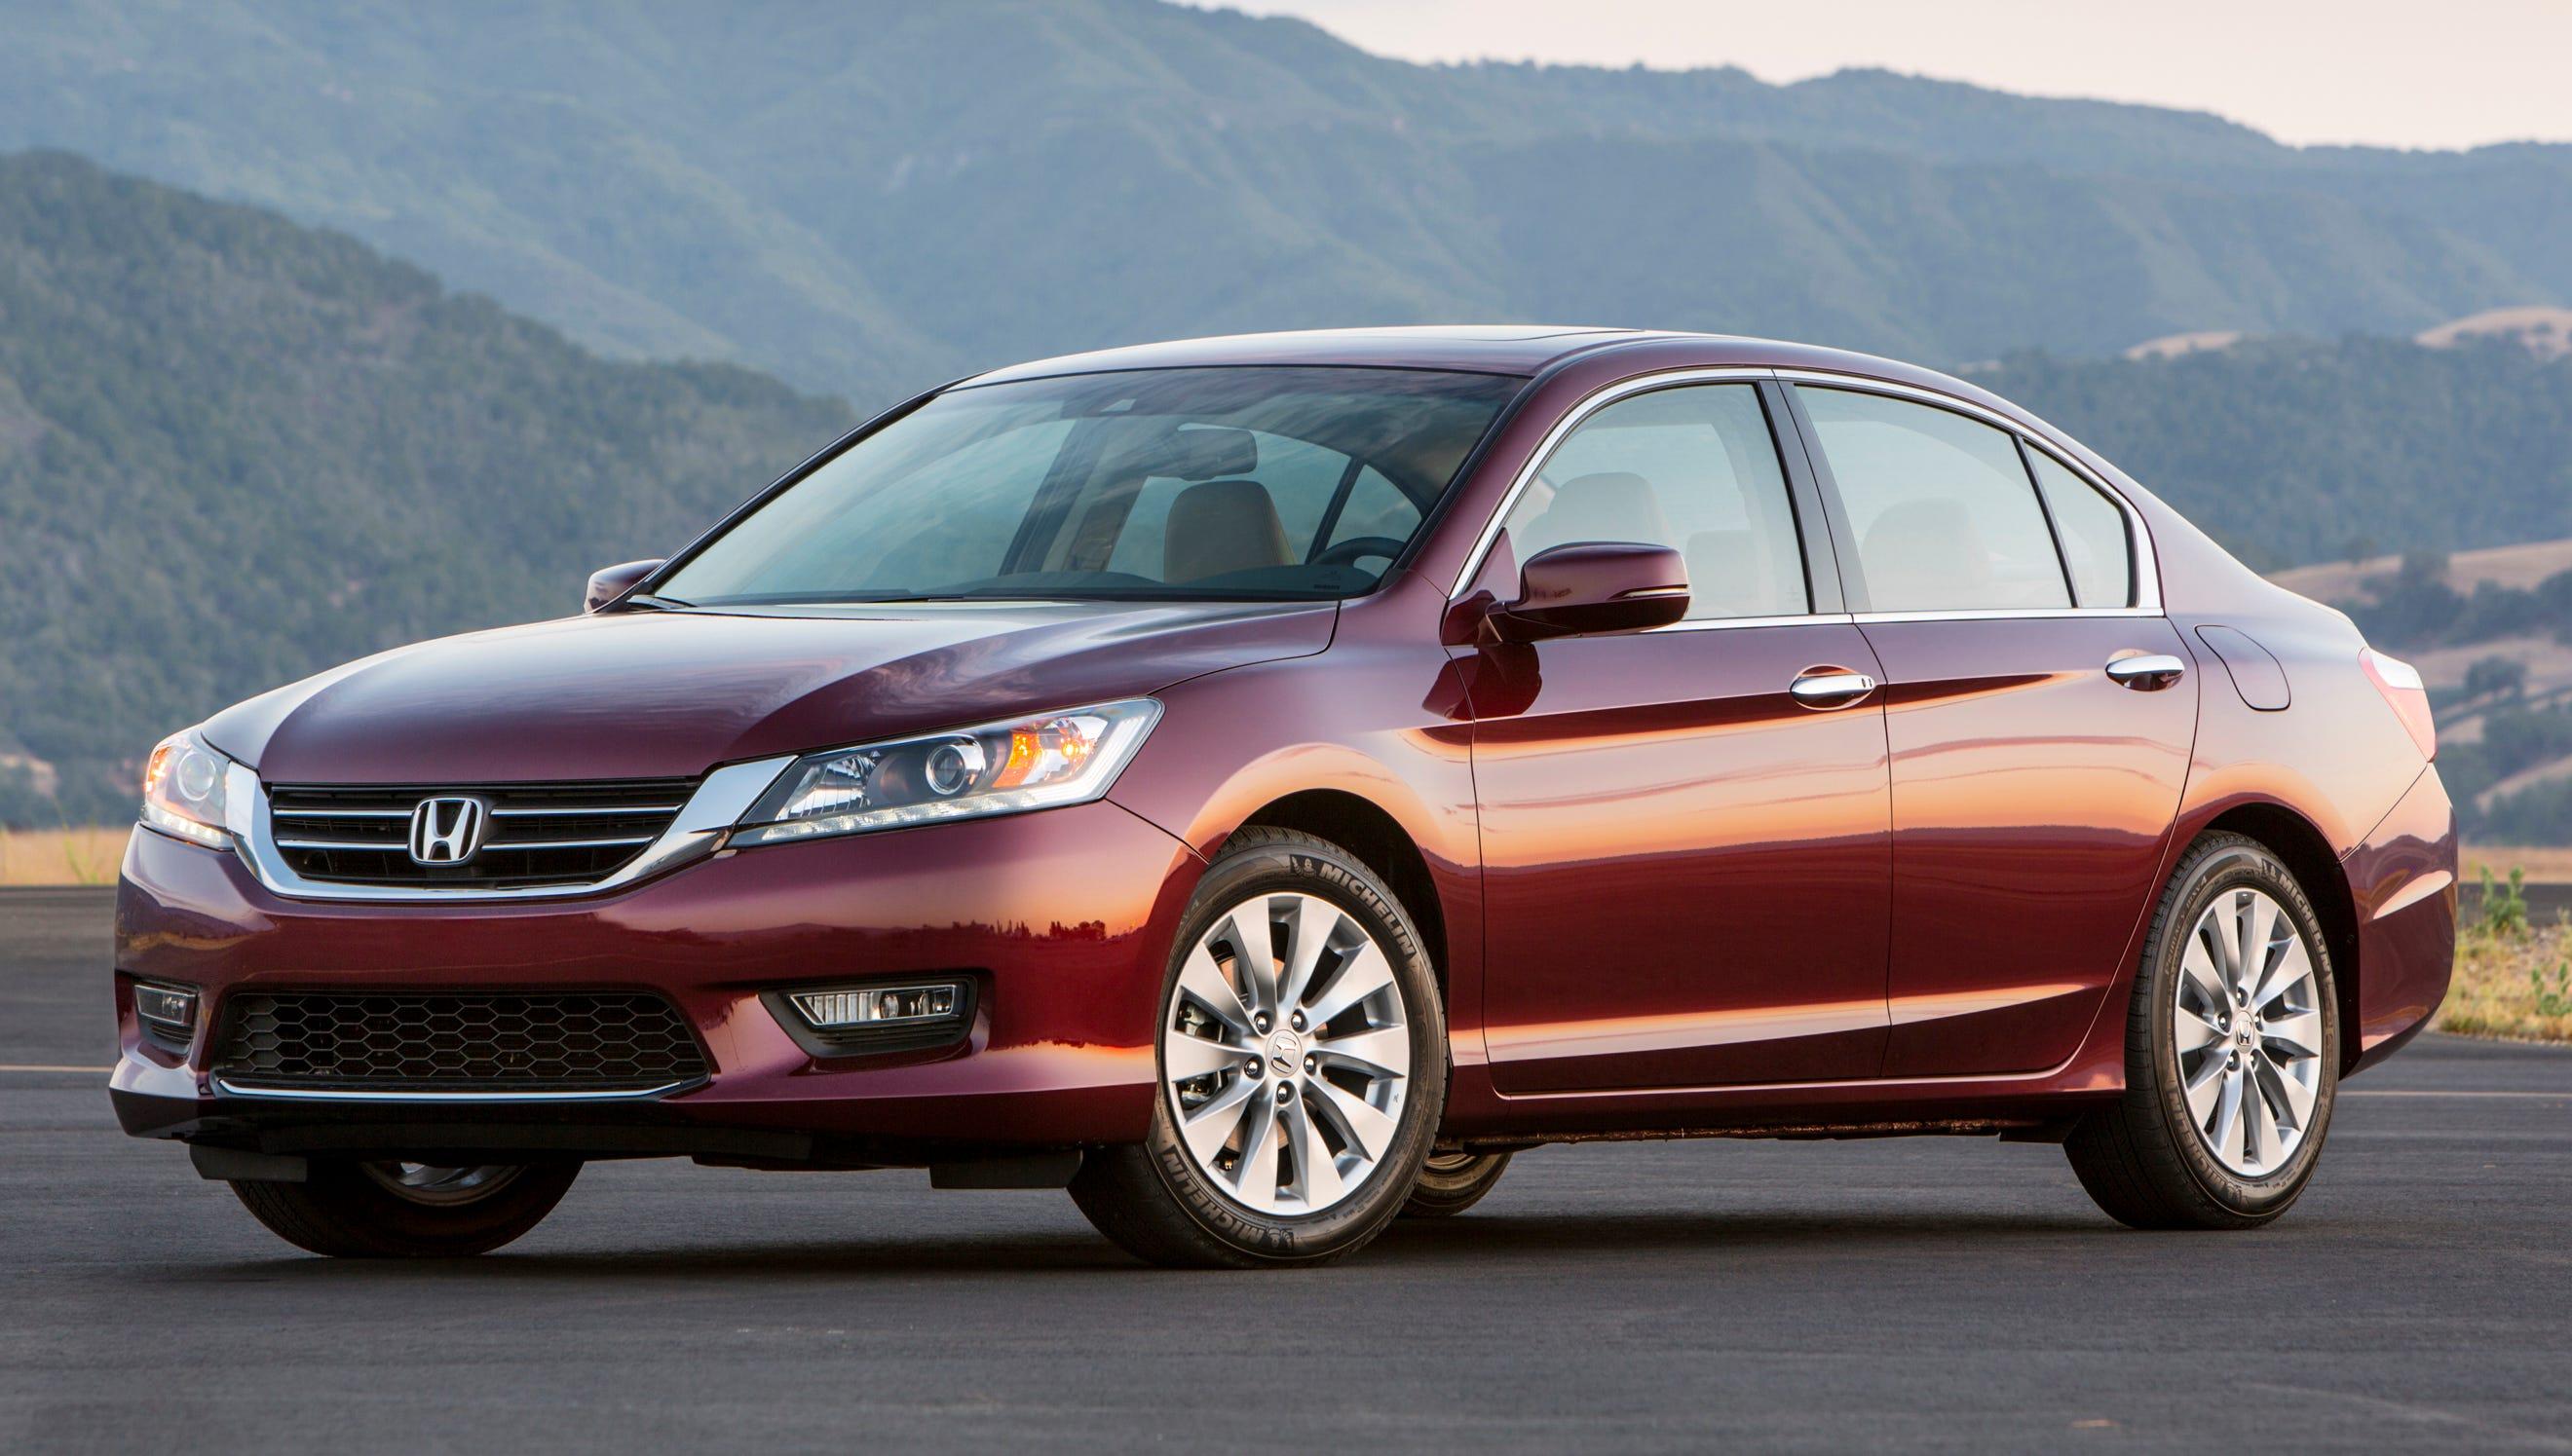 This year's Edmunds.com Top 10 Best Cars for Short Drivers includes the popula Honda Accord sedan starting at $22,479 (a 2013 Honda Accord EX-L V-6 sedan shown here).